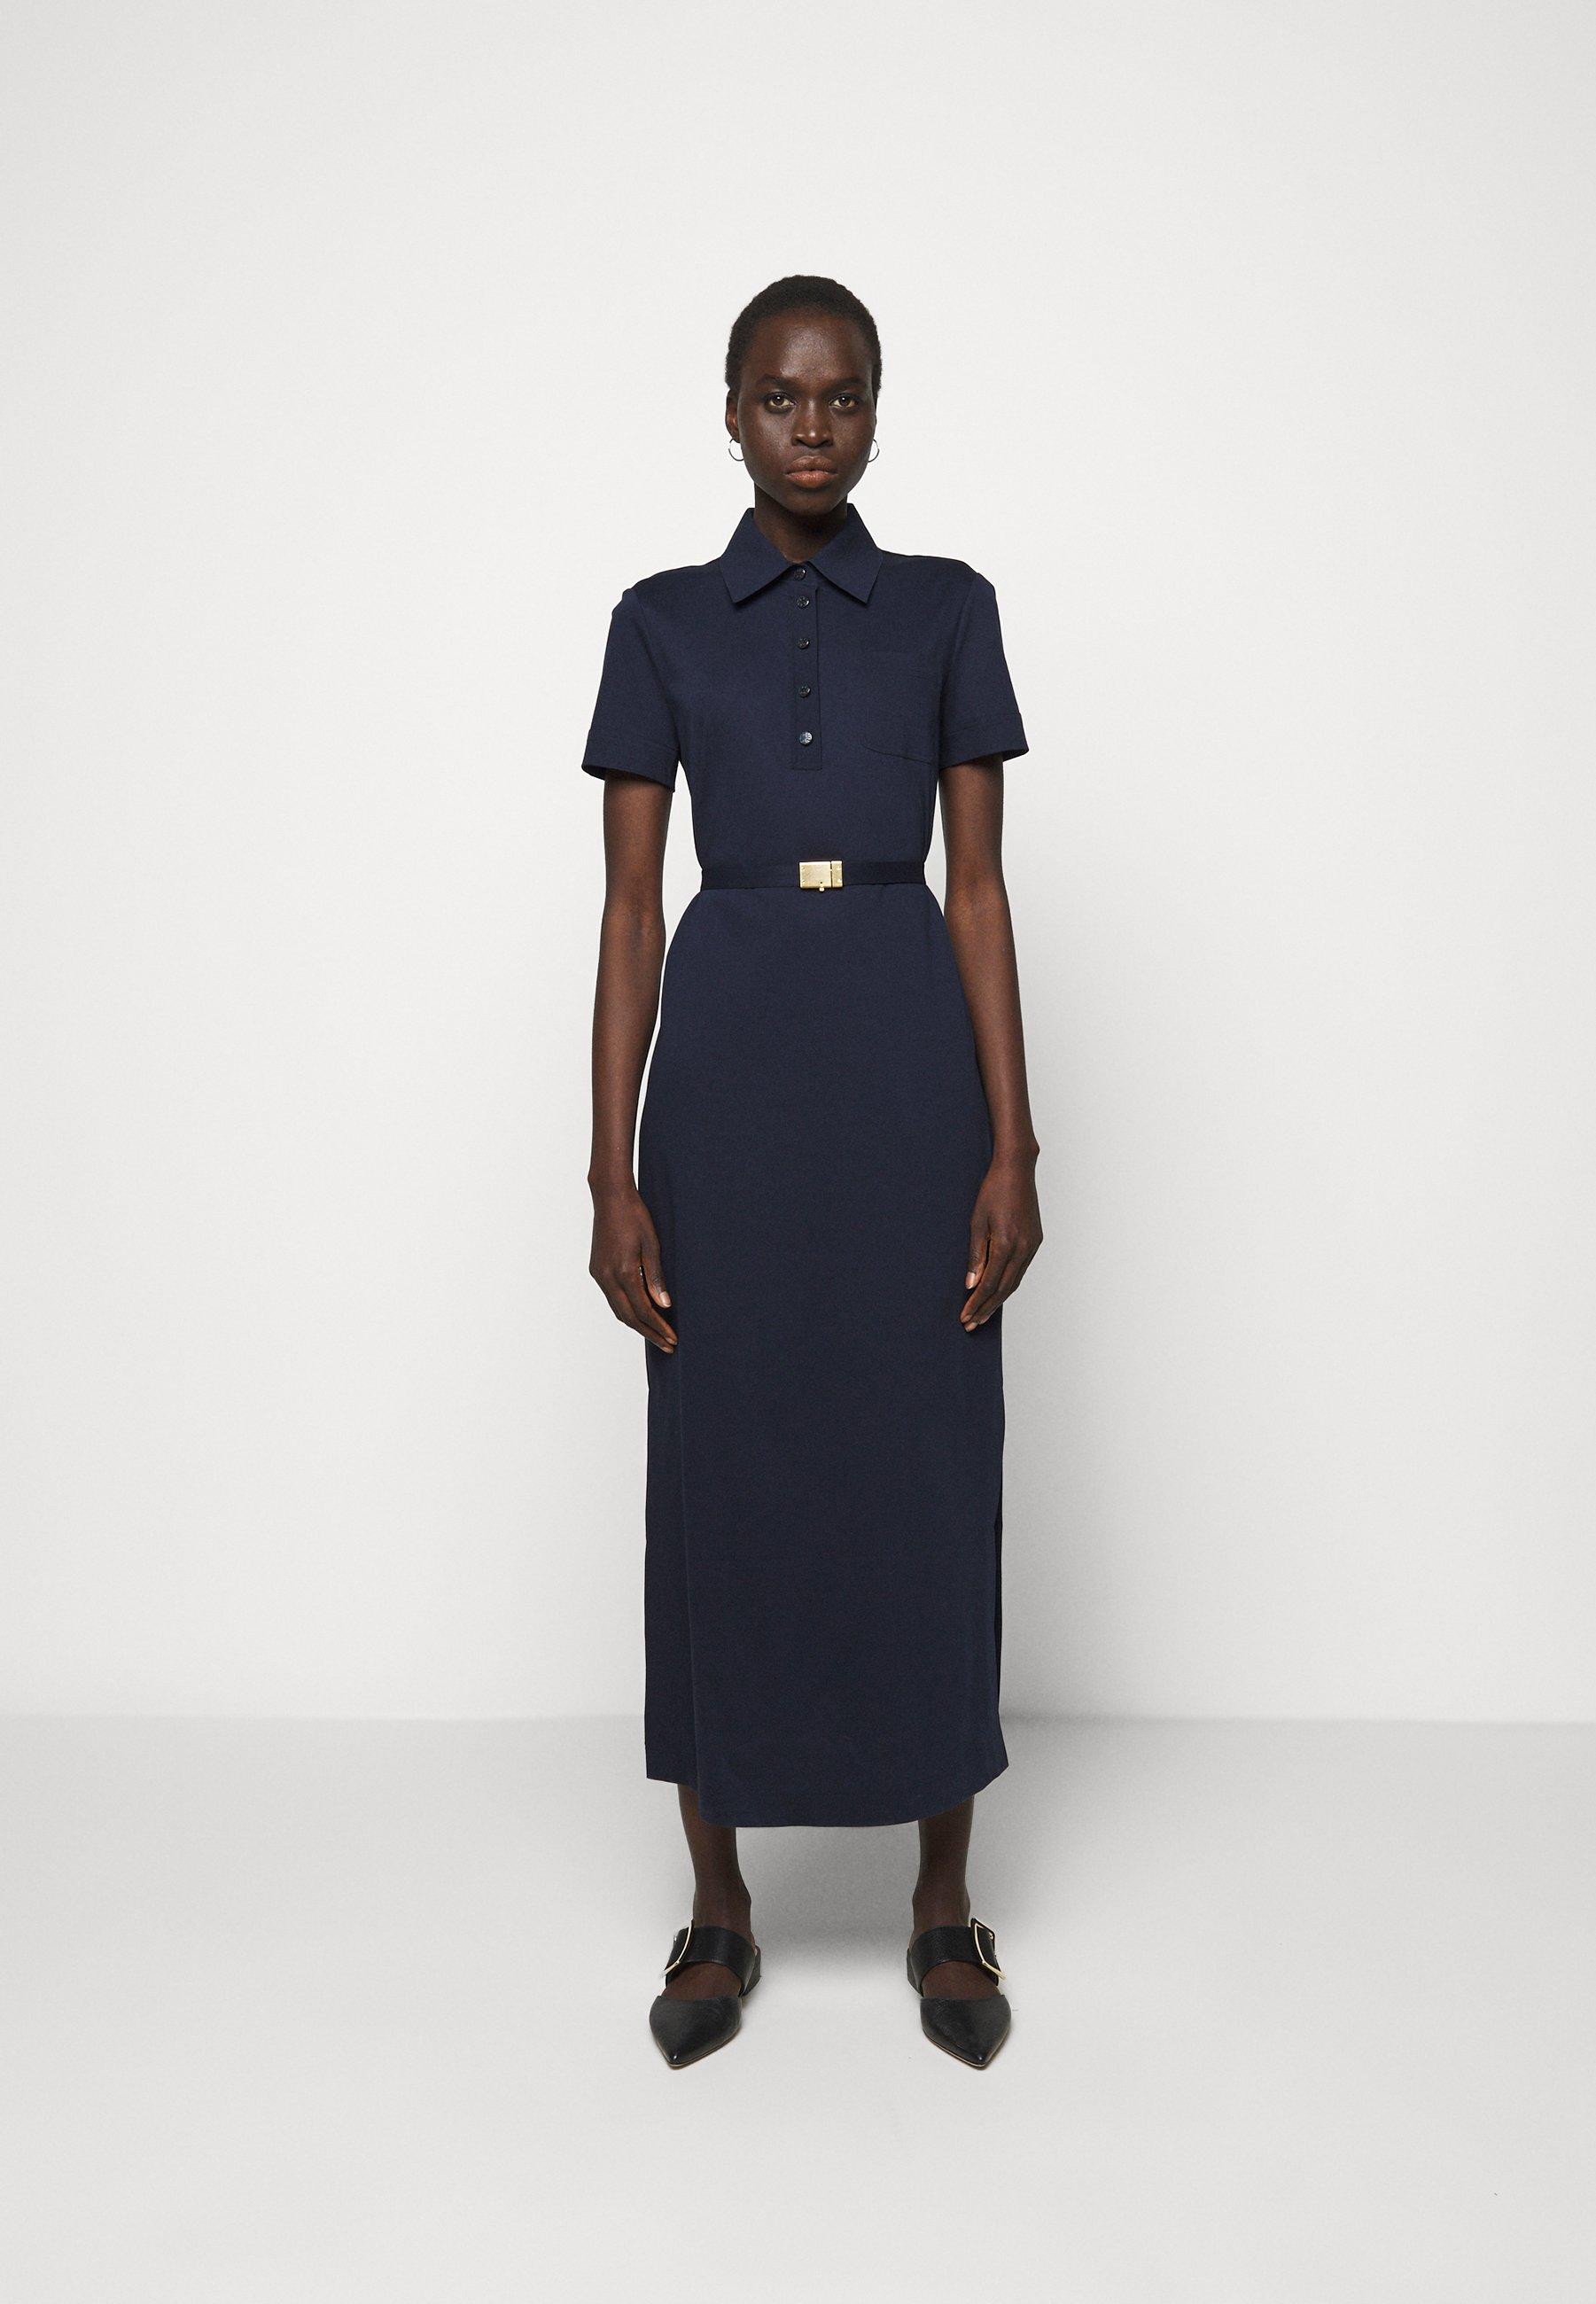 Femme POLO DRESS - Robe longue